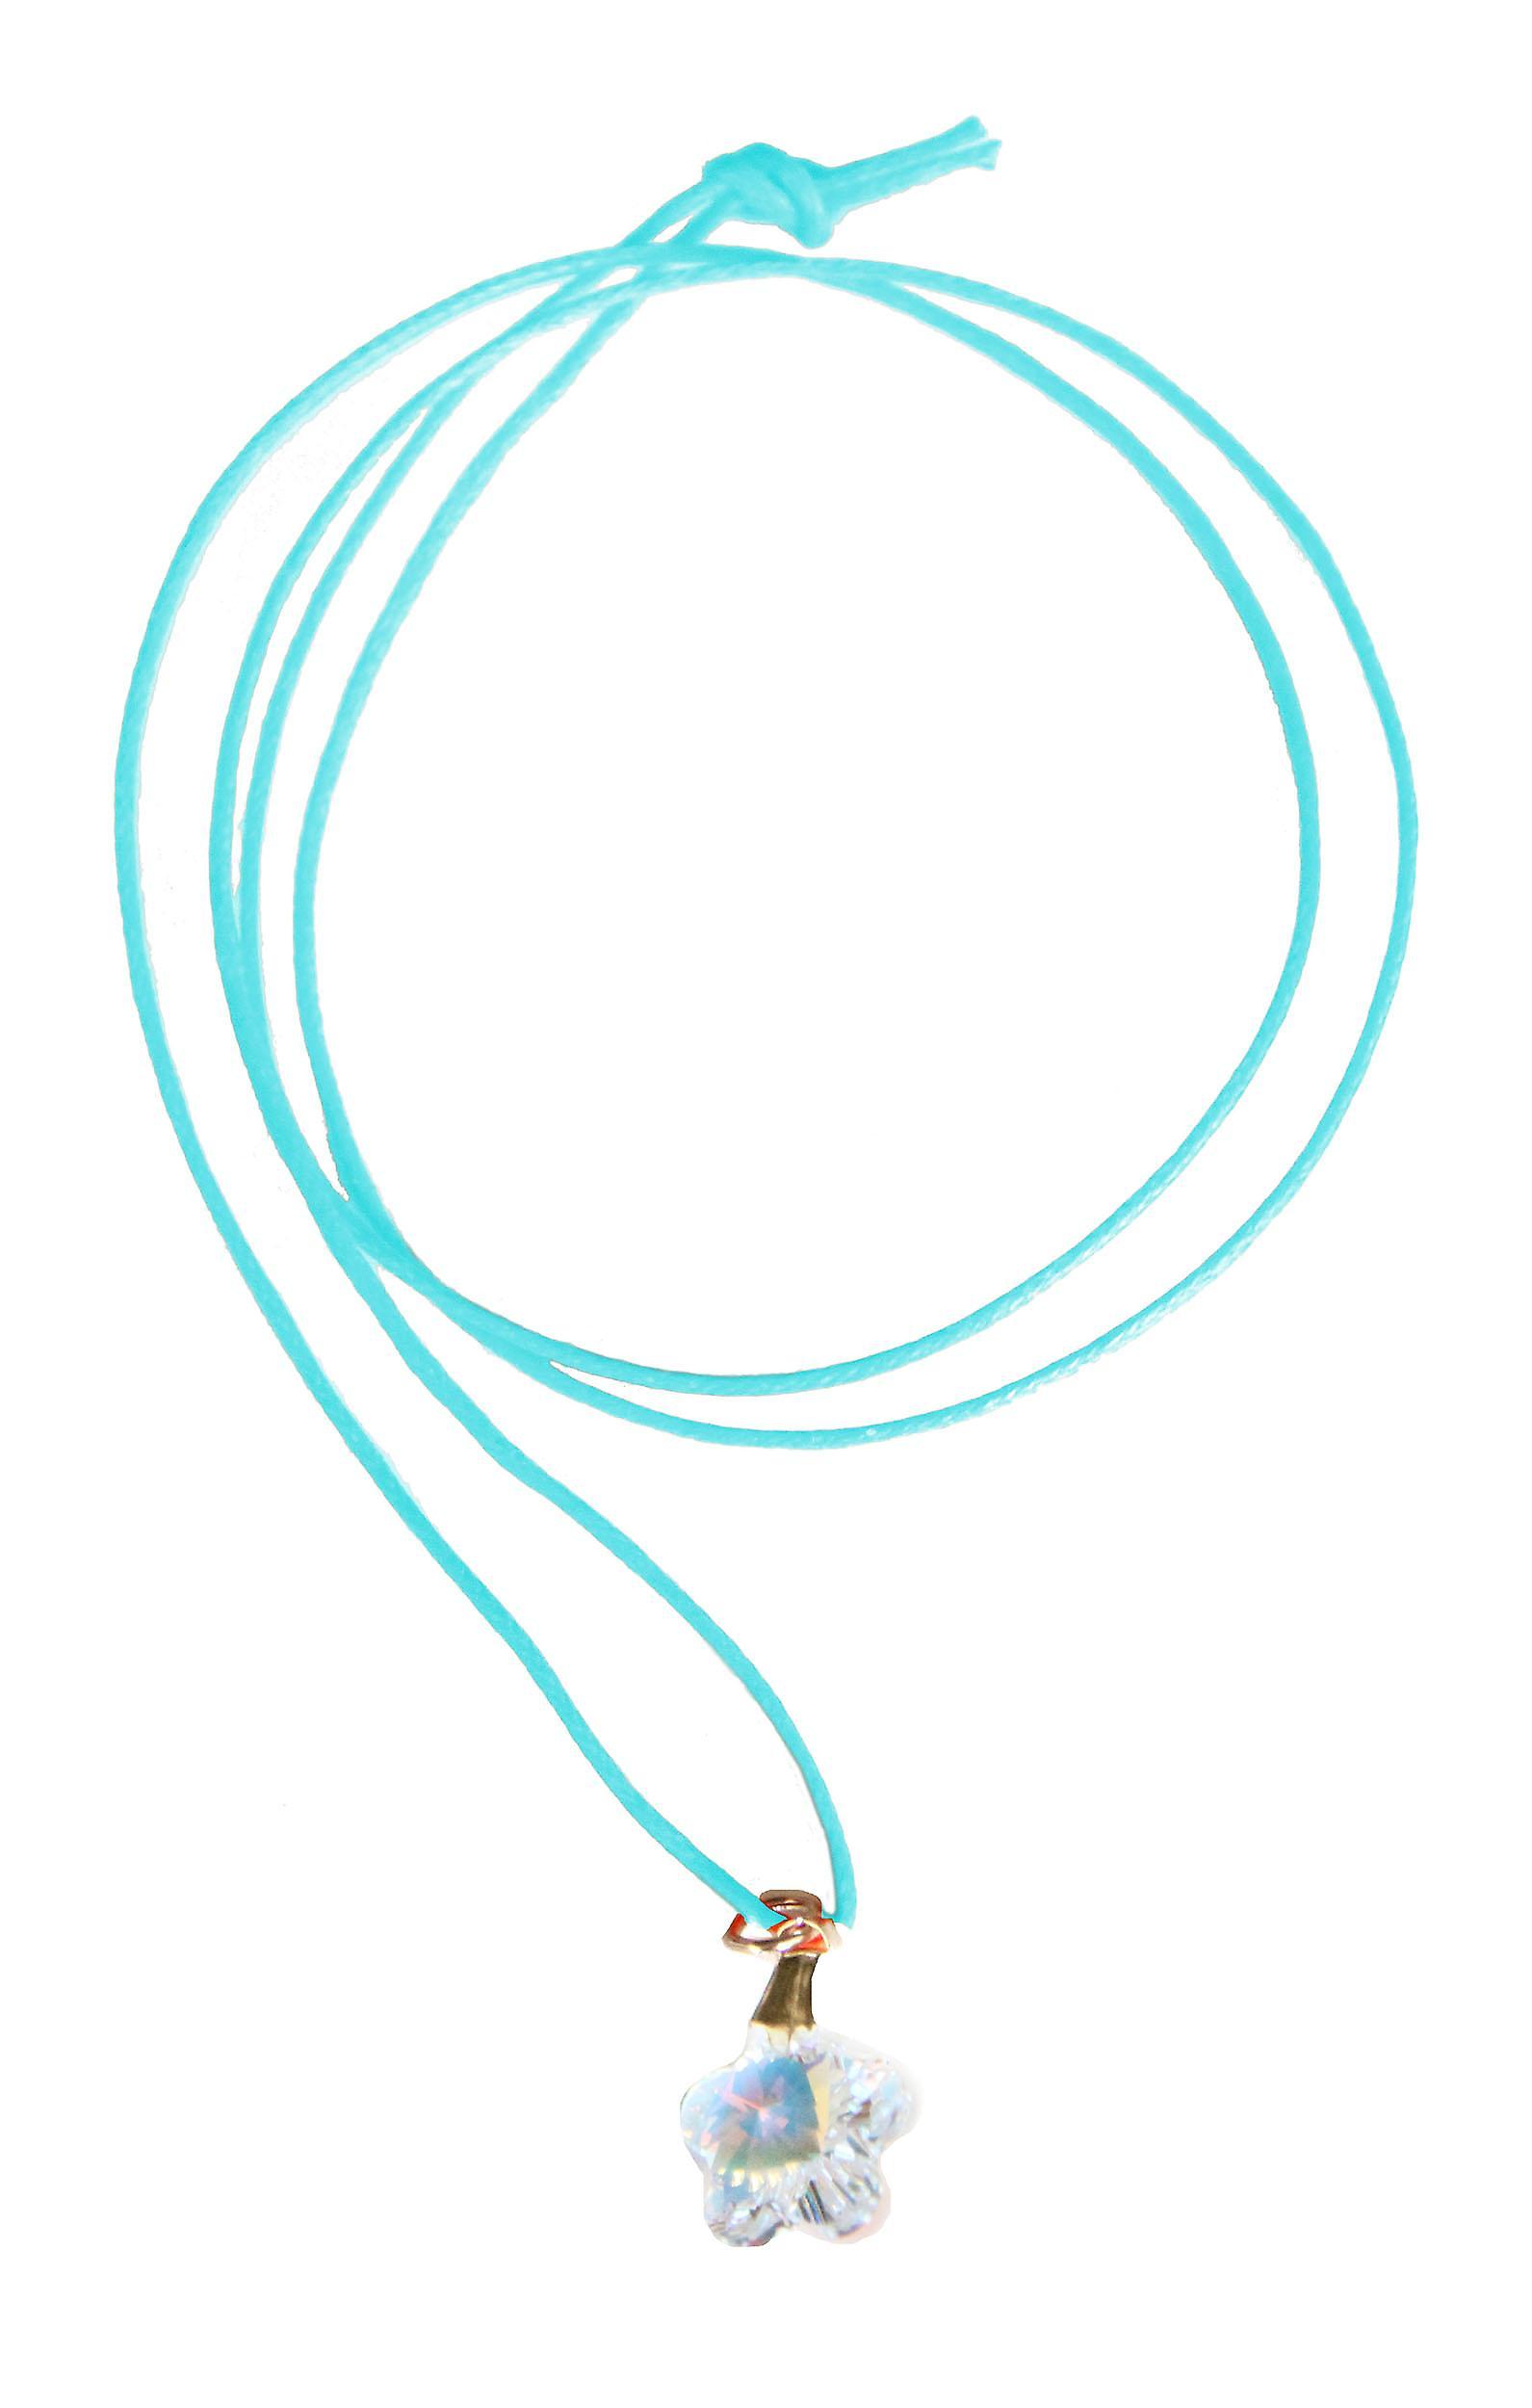 Waooh - Bijoux - Swarovski / Pendentif fleur nacré reflet bleu